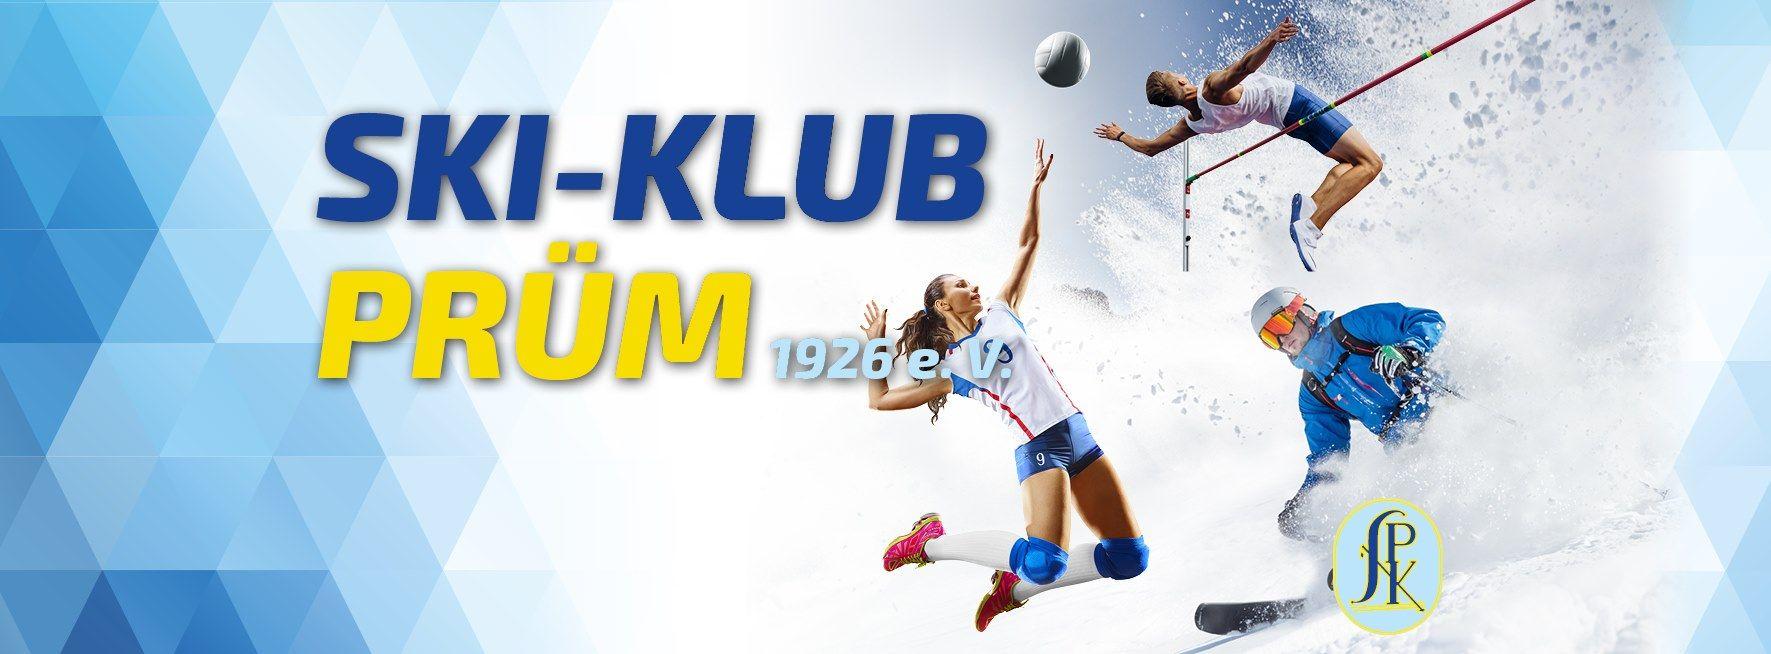 Give feedback - Feedback | Ski-Klub Prüm 1926 e